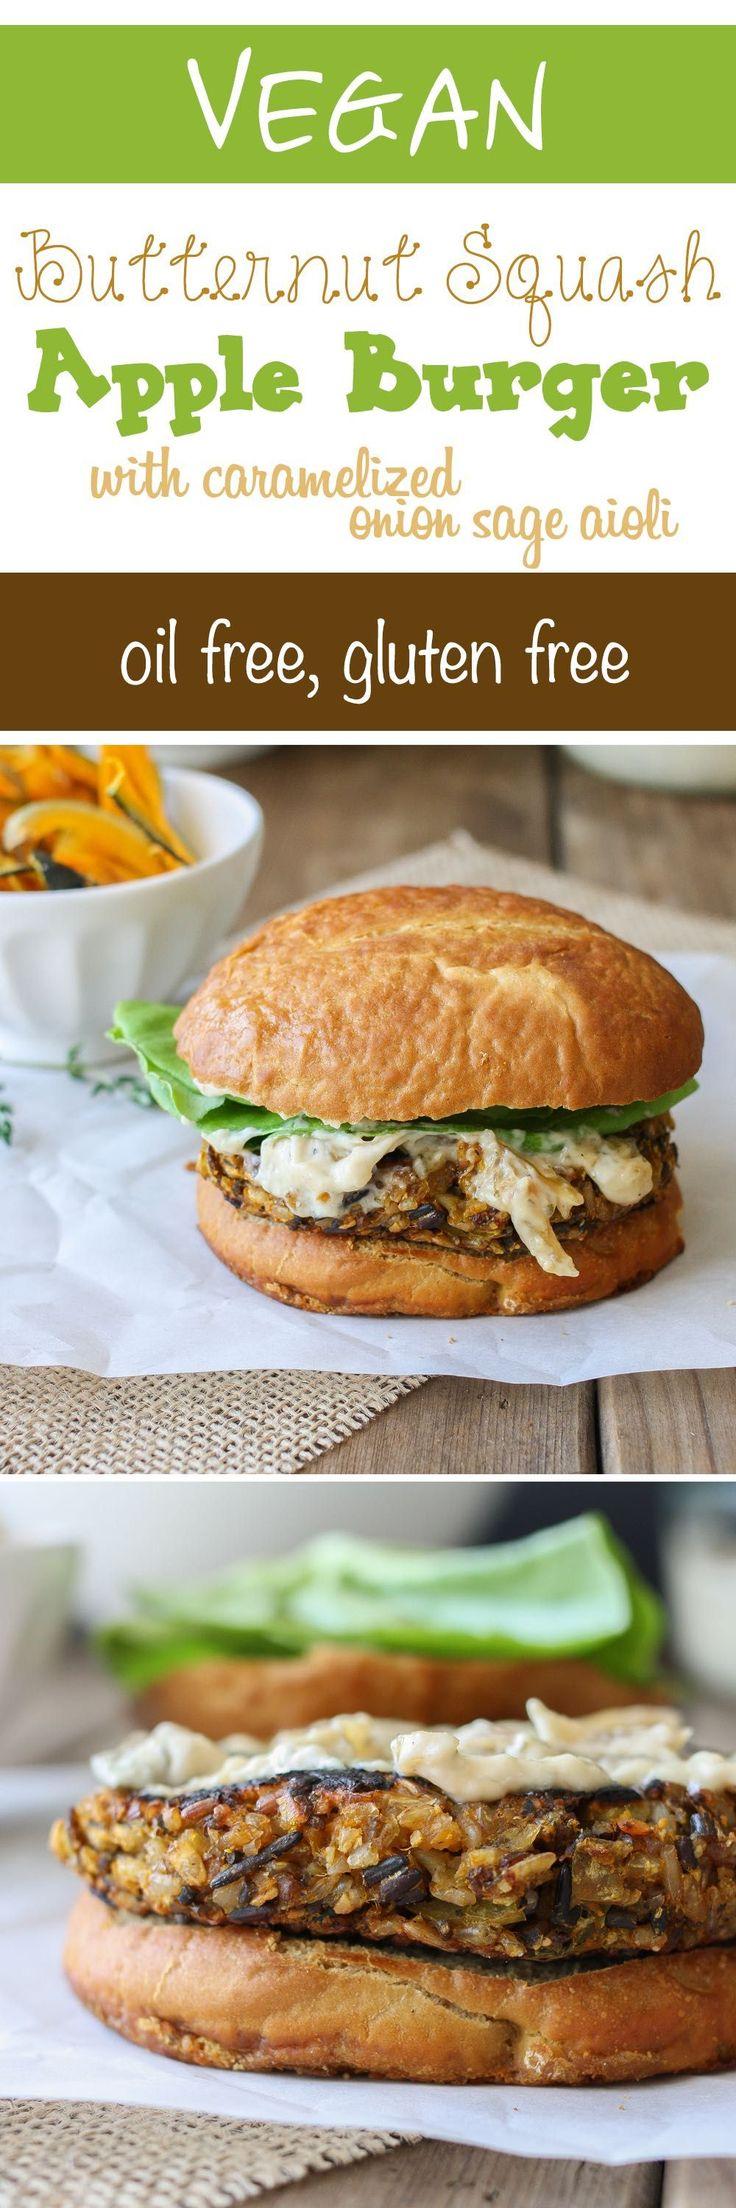 Butternut squash apple burger   www.veggiesdontbite.com   #vegan #plantbased #glutenfree #oilfree